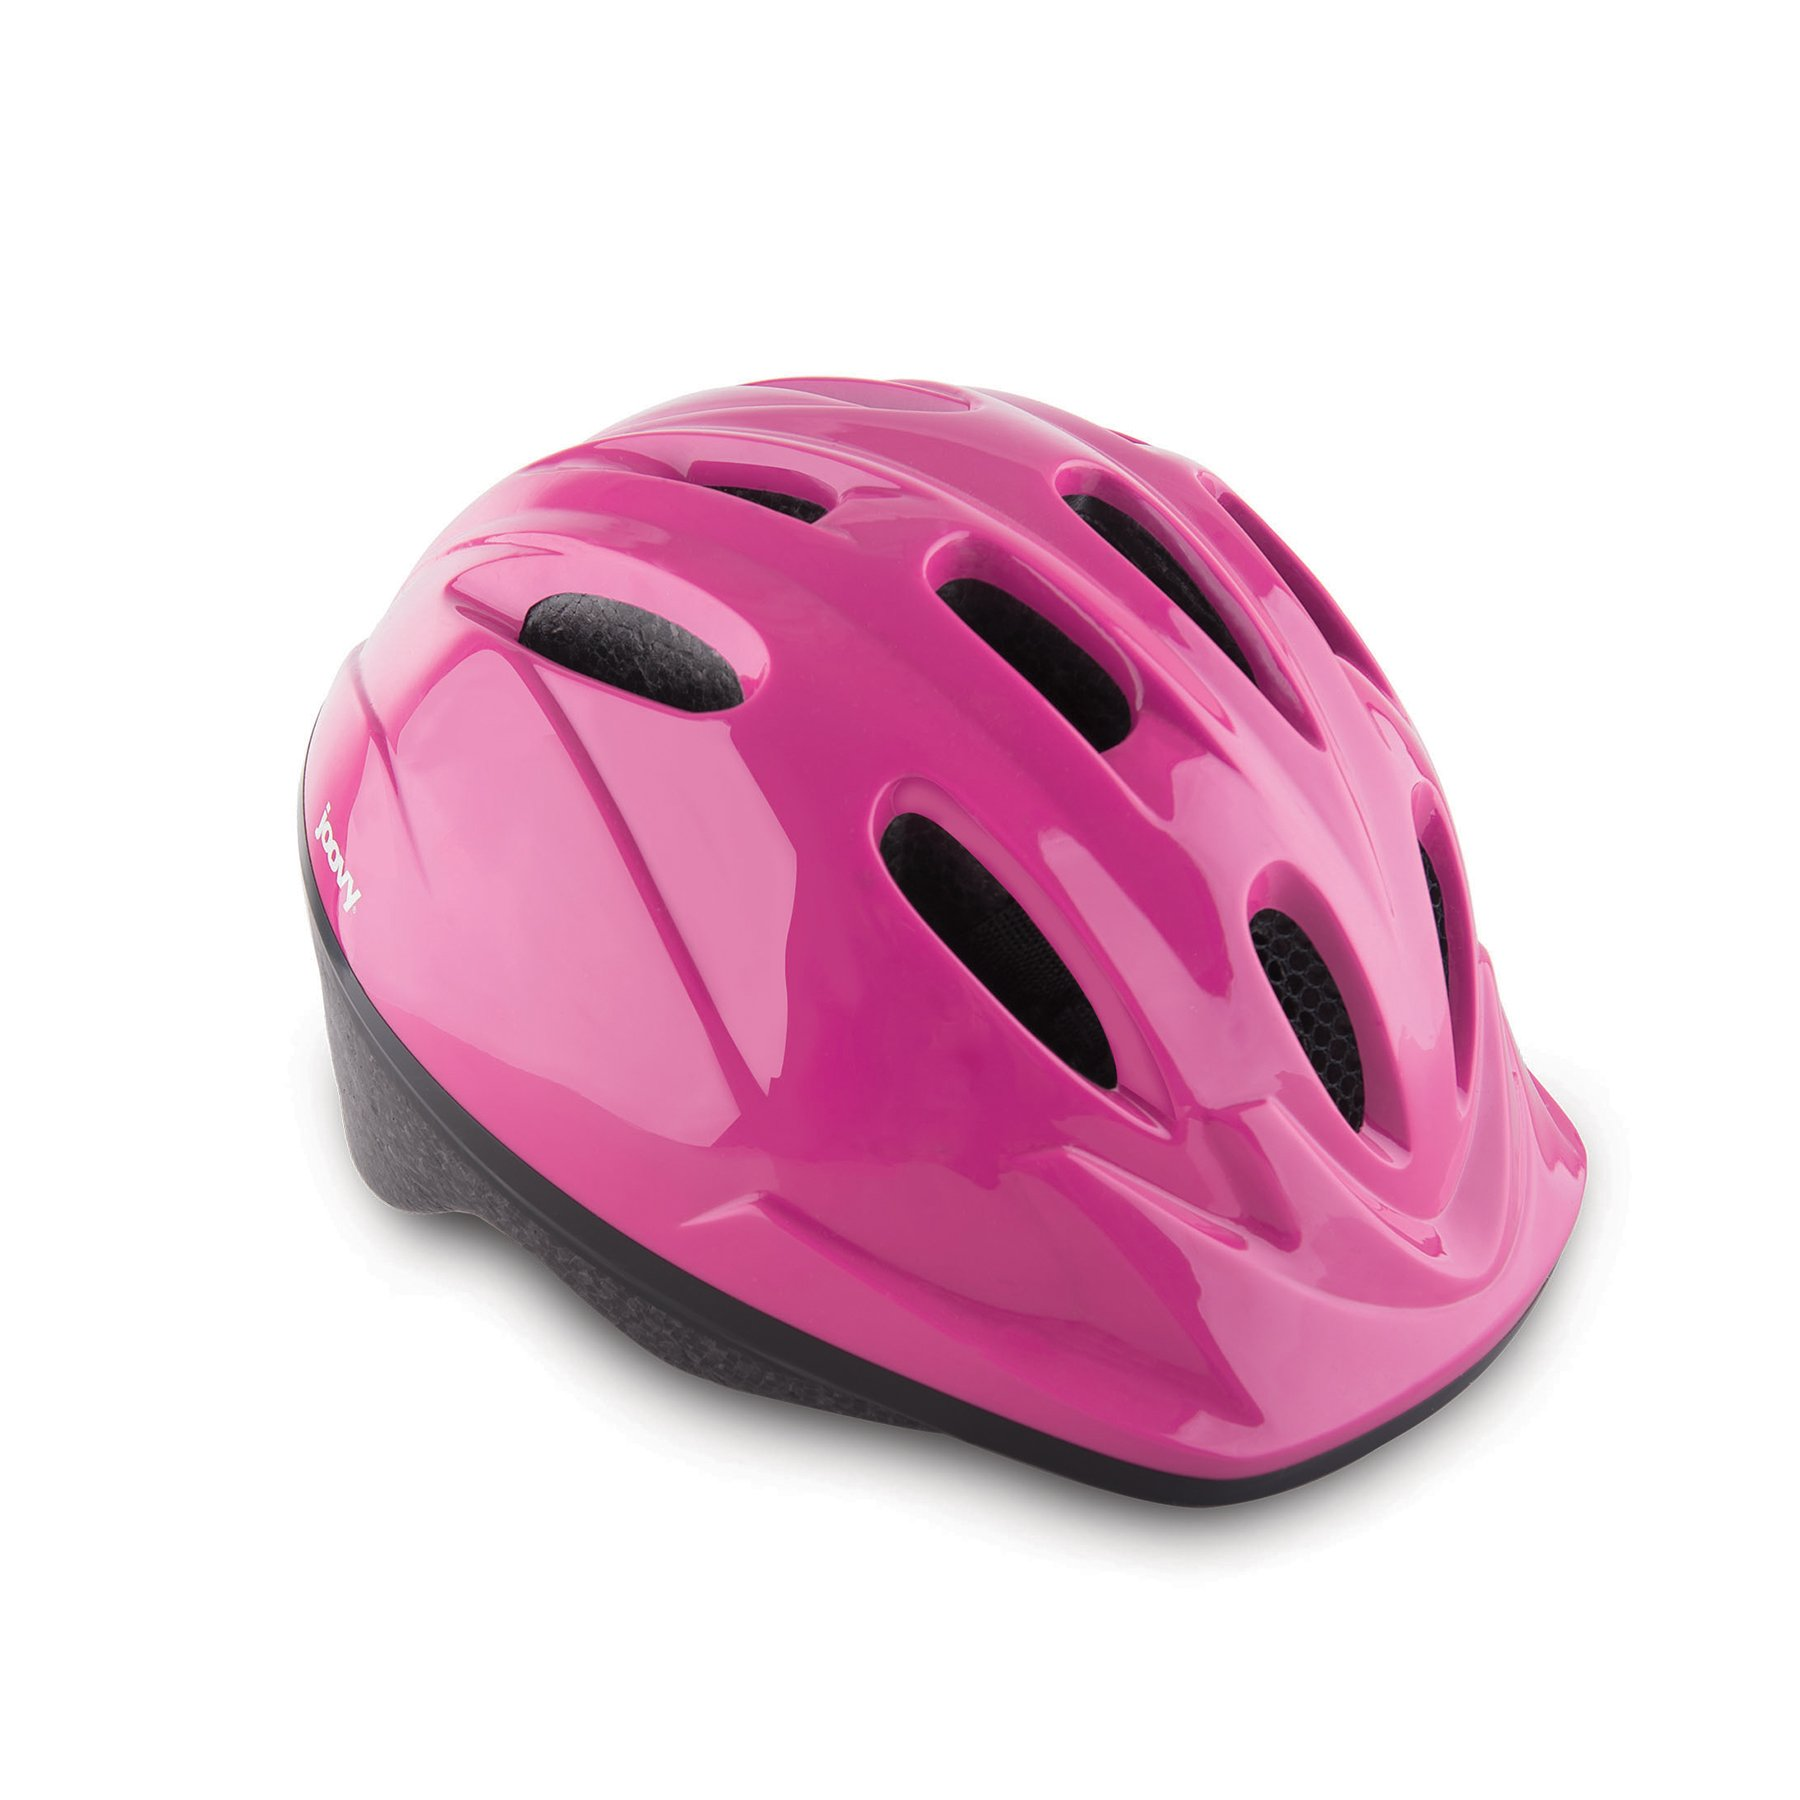 Joovy Noodle Helmet Small, Pink